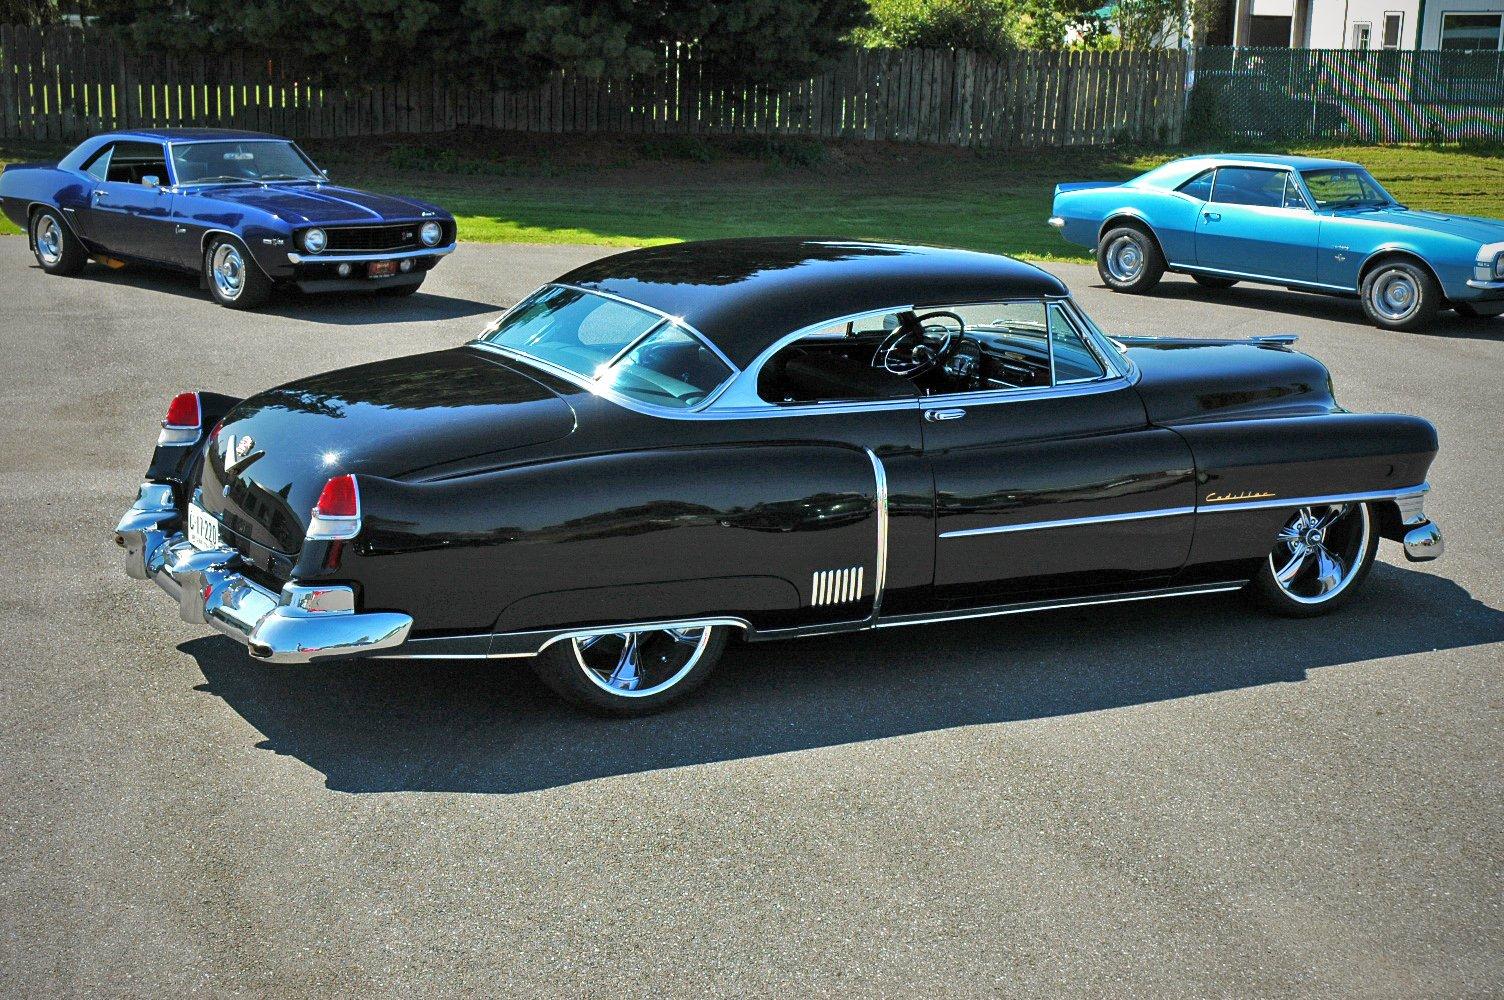 1952 Cadillac Series 62 Coupe Hotrod Streetrod Hot Rod